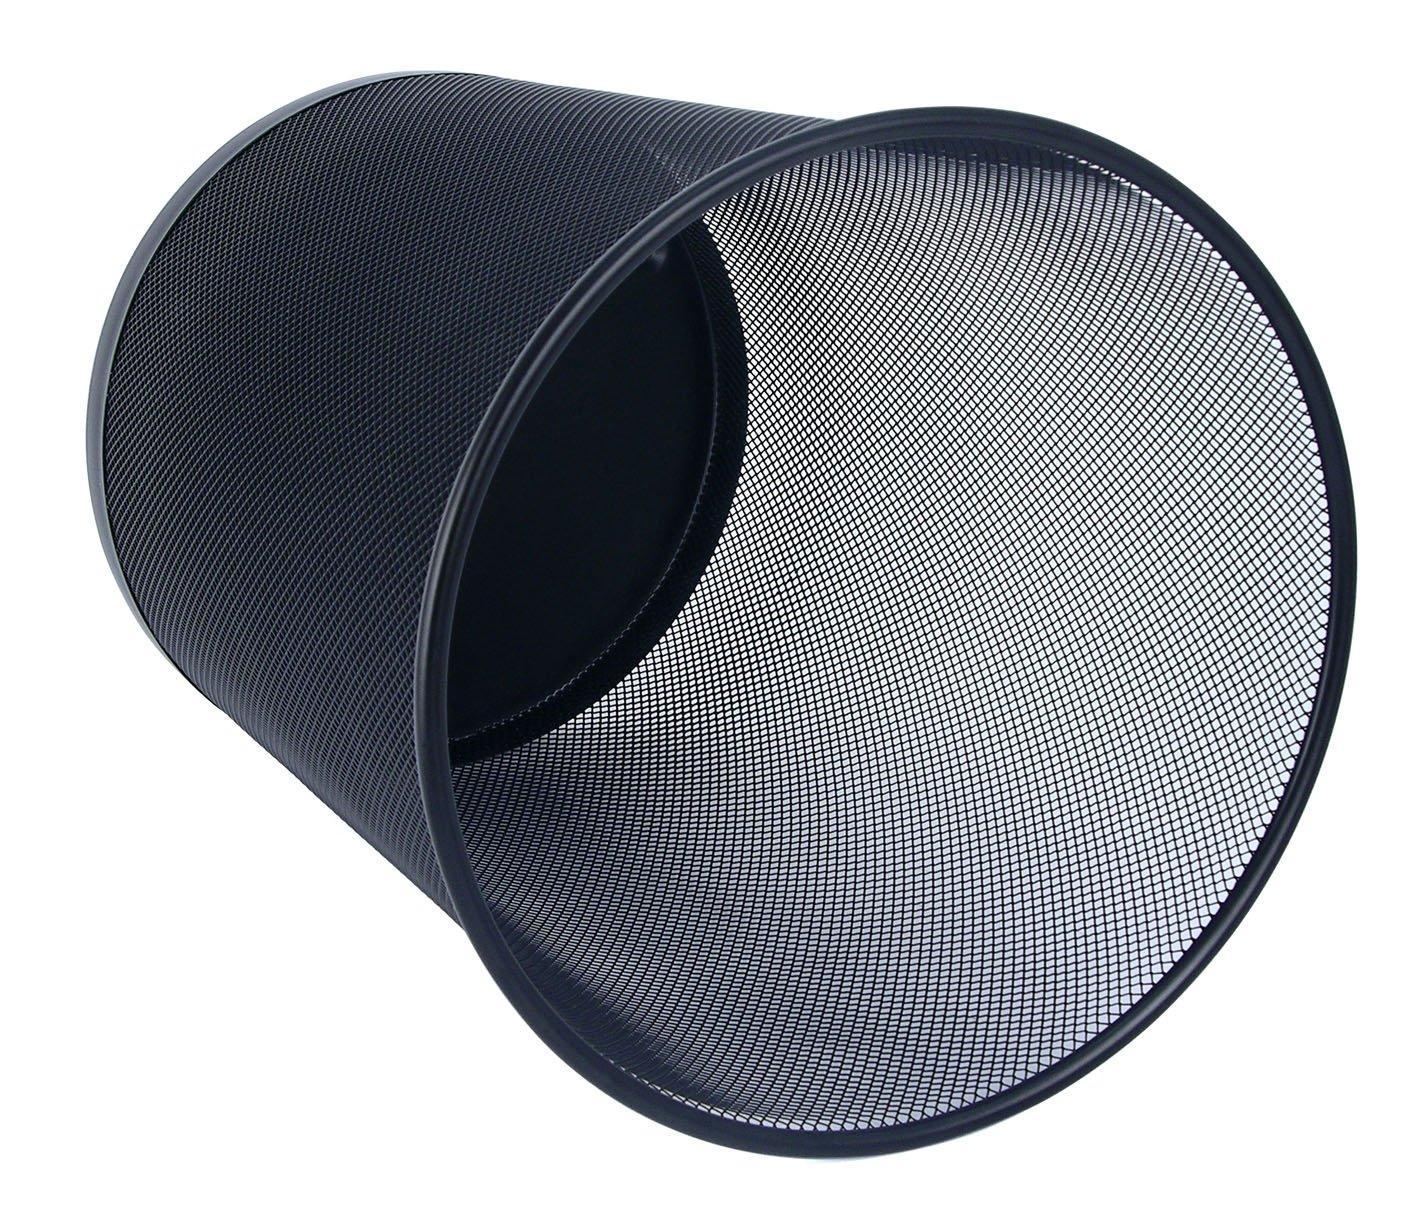 Wedo 65201 Papierkorb Office (18 l, Drahtmetall) schwarz: Amazon ...